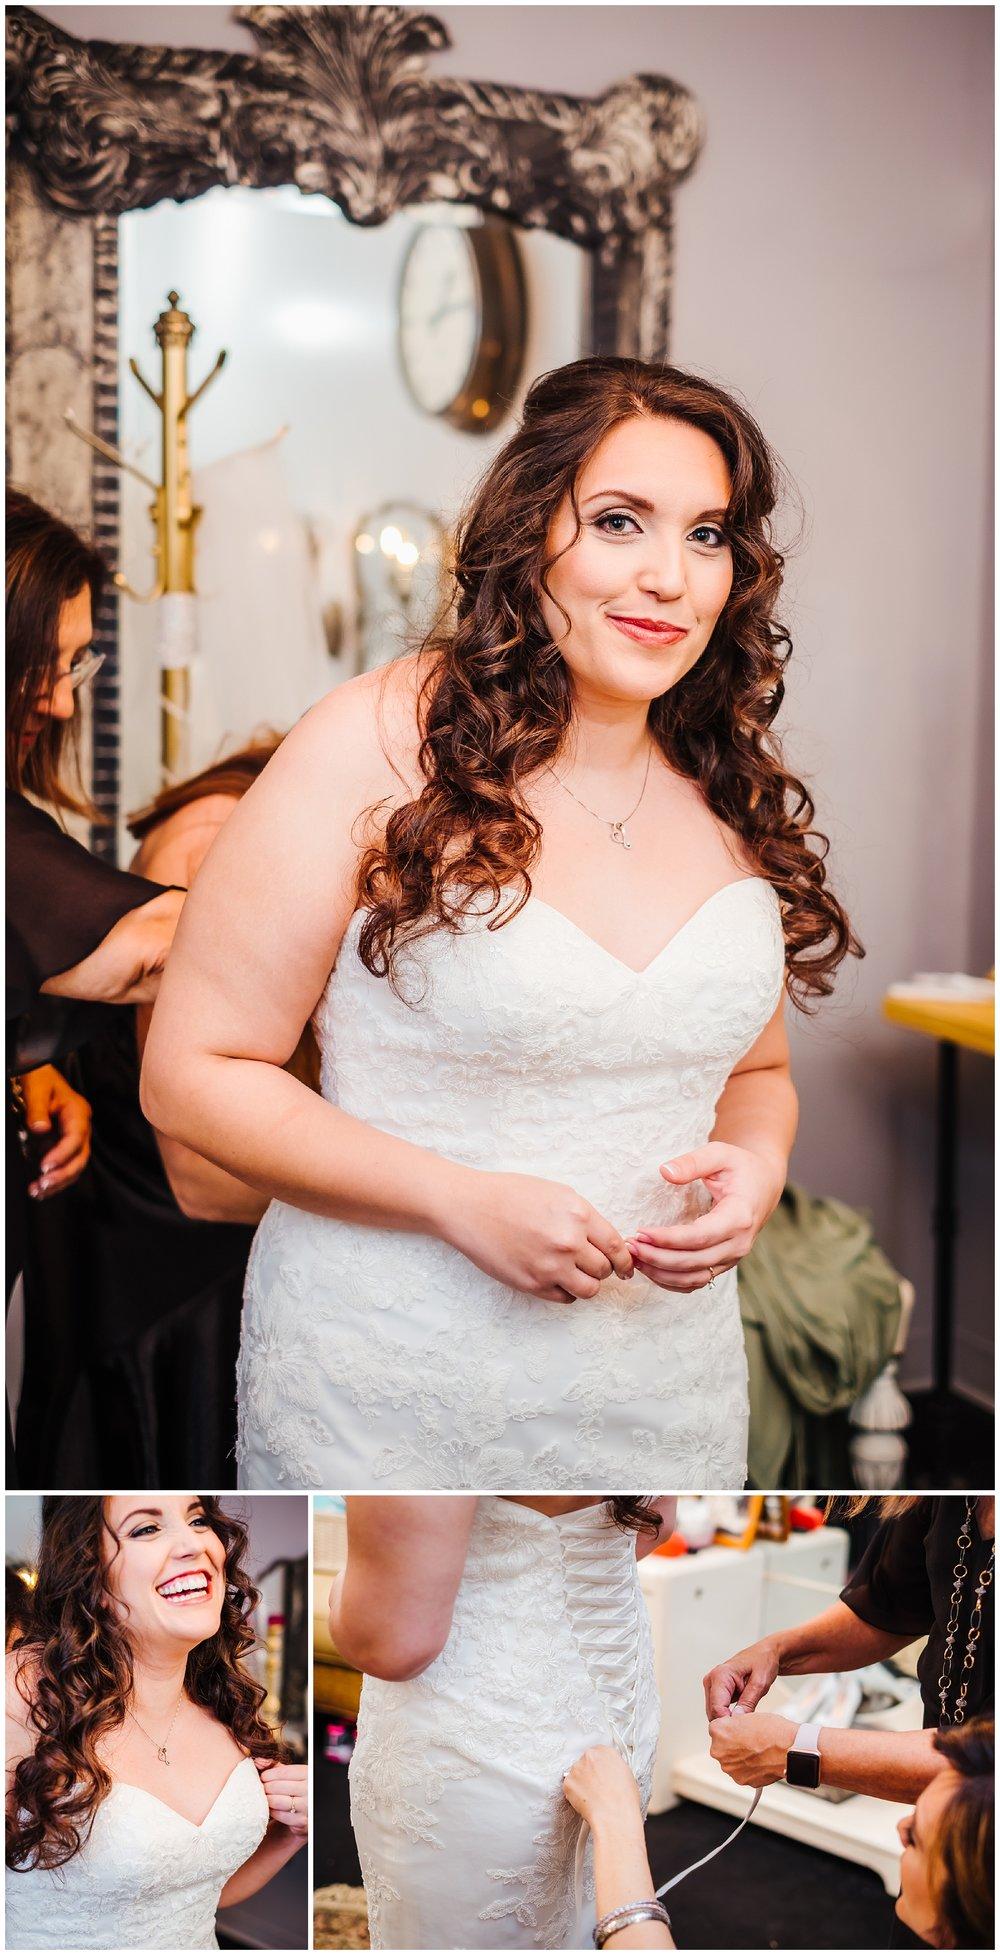 tampa-wedding-photographer-unique-indoor-venue_0010.jpg